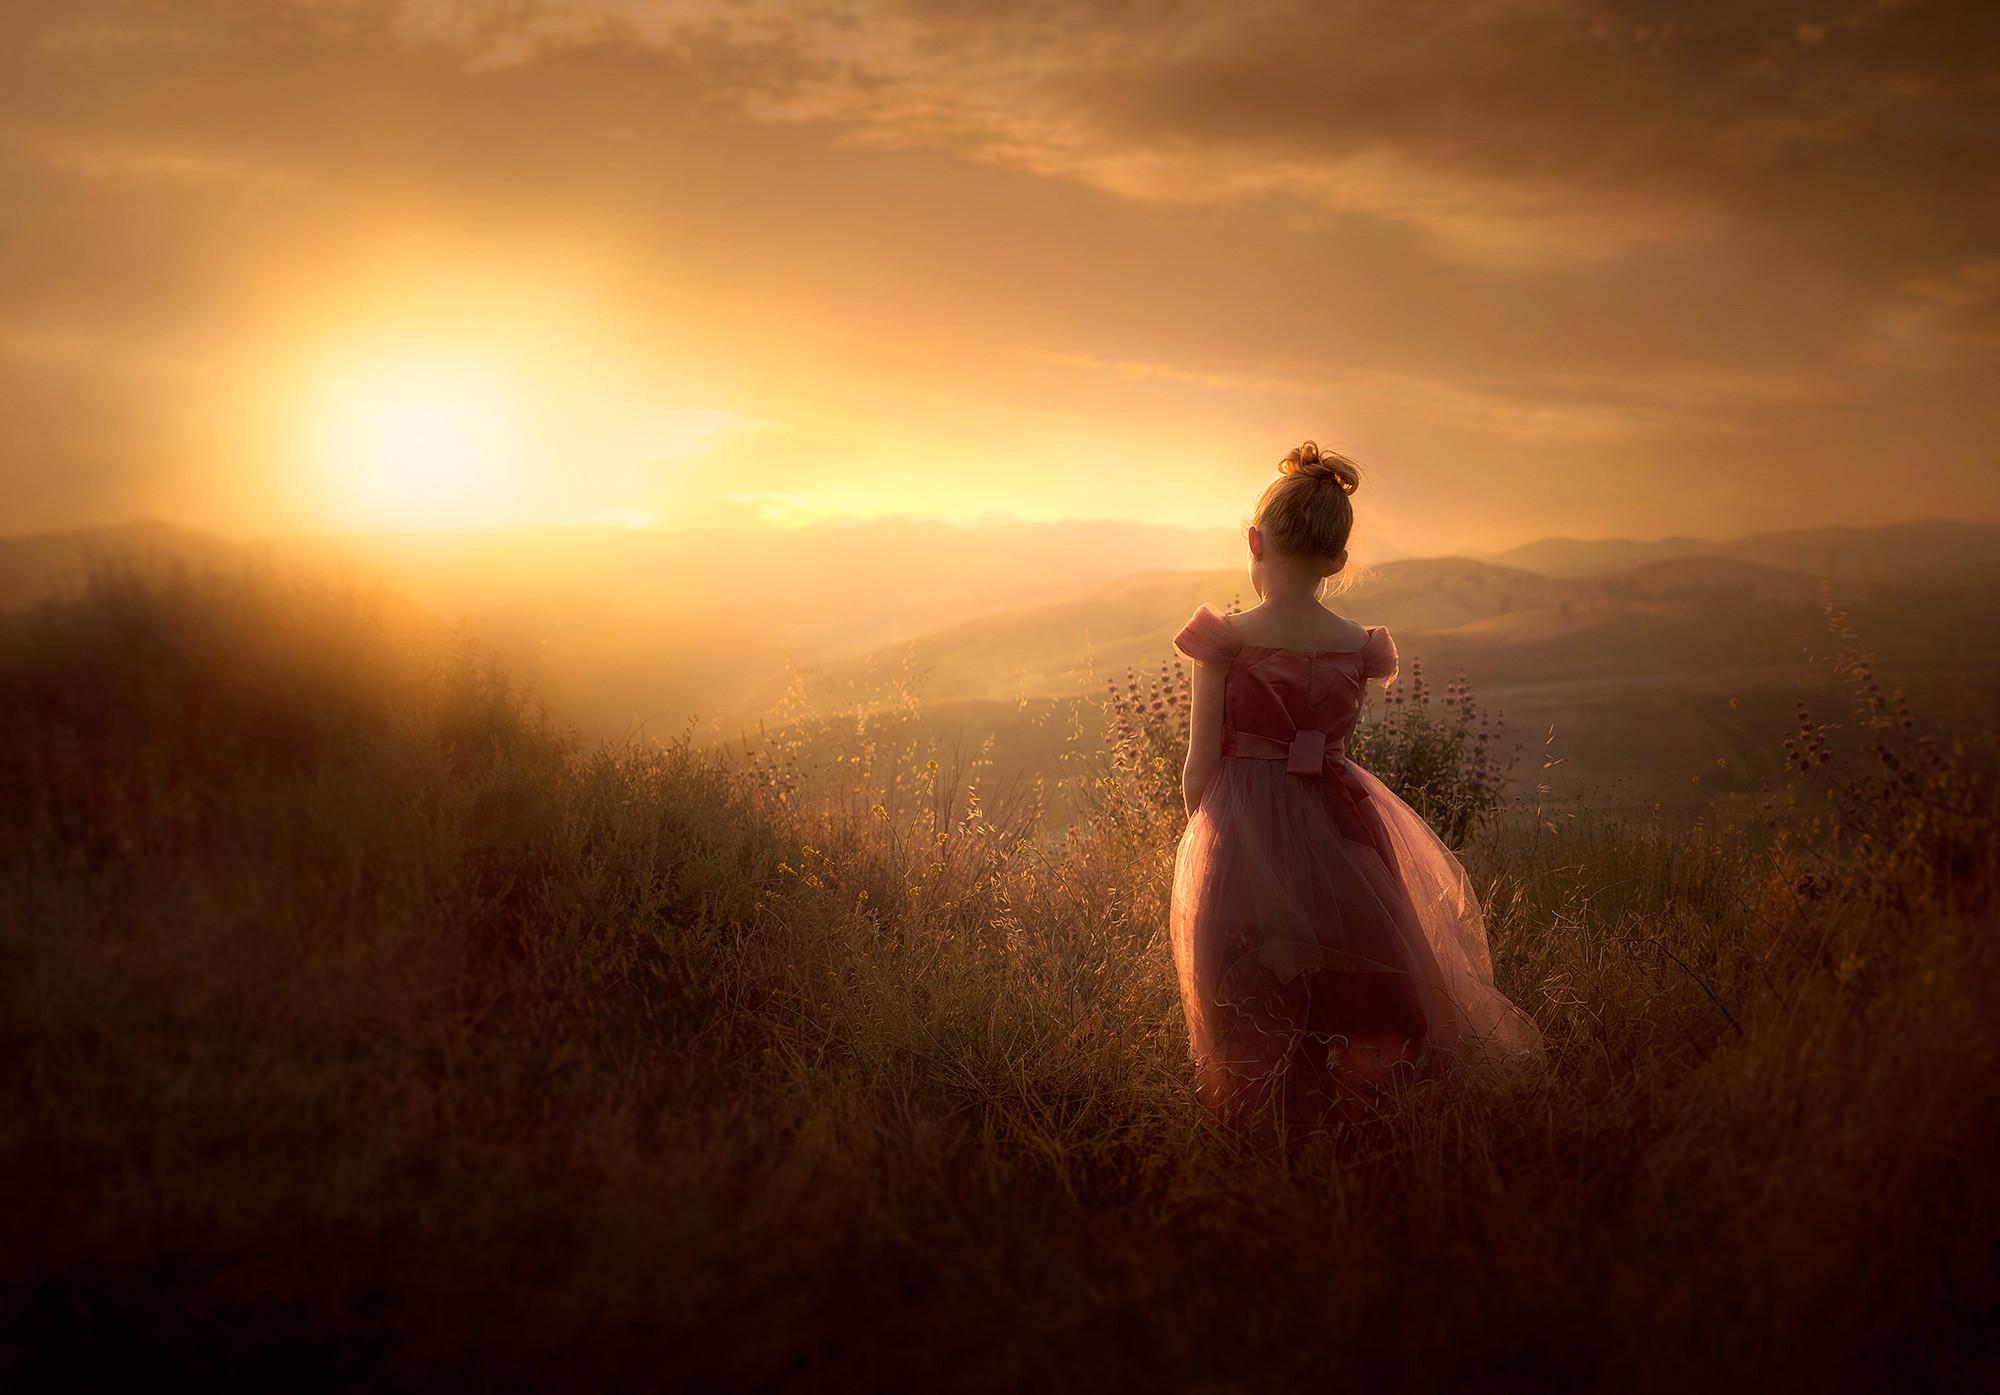 People 2000x1395 children sunset Sun field nature landscape clouds sky warm warm light flowers dress young woman blonde soft gradient  vignette Jessica Drossin outdoors